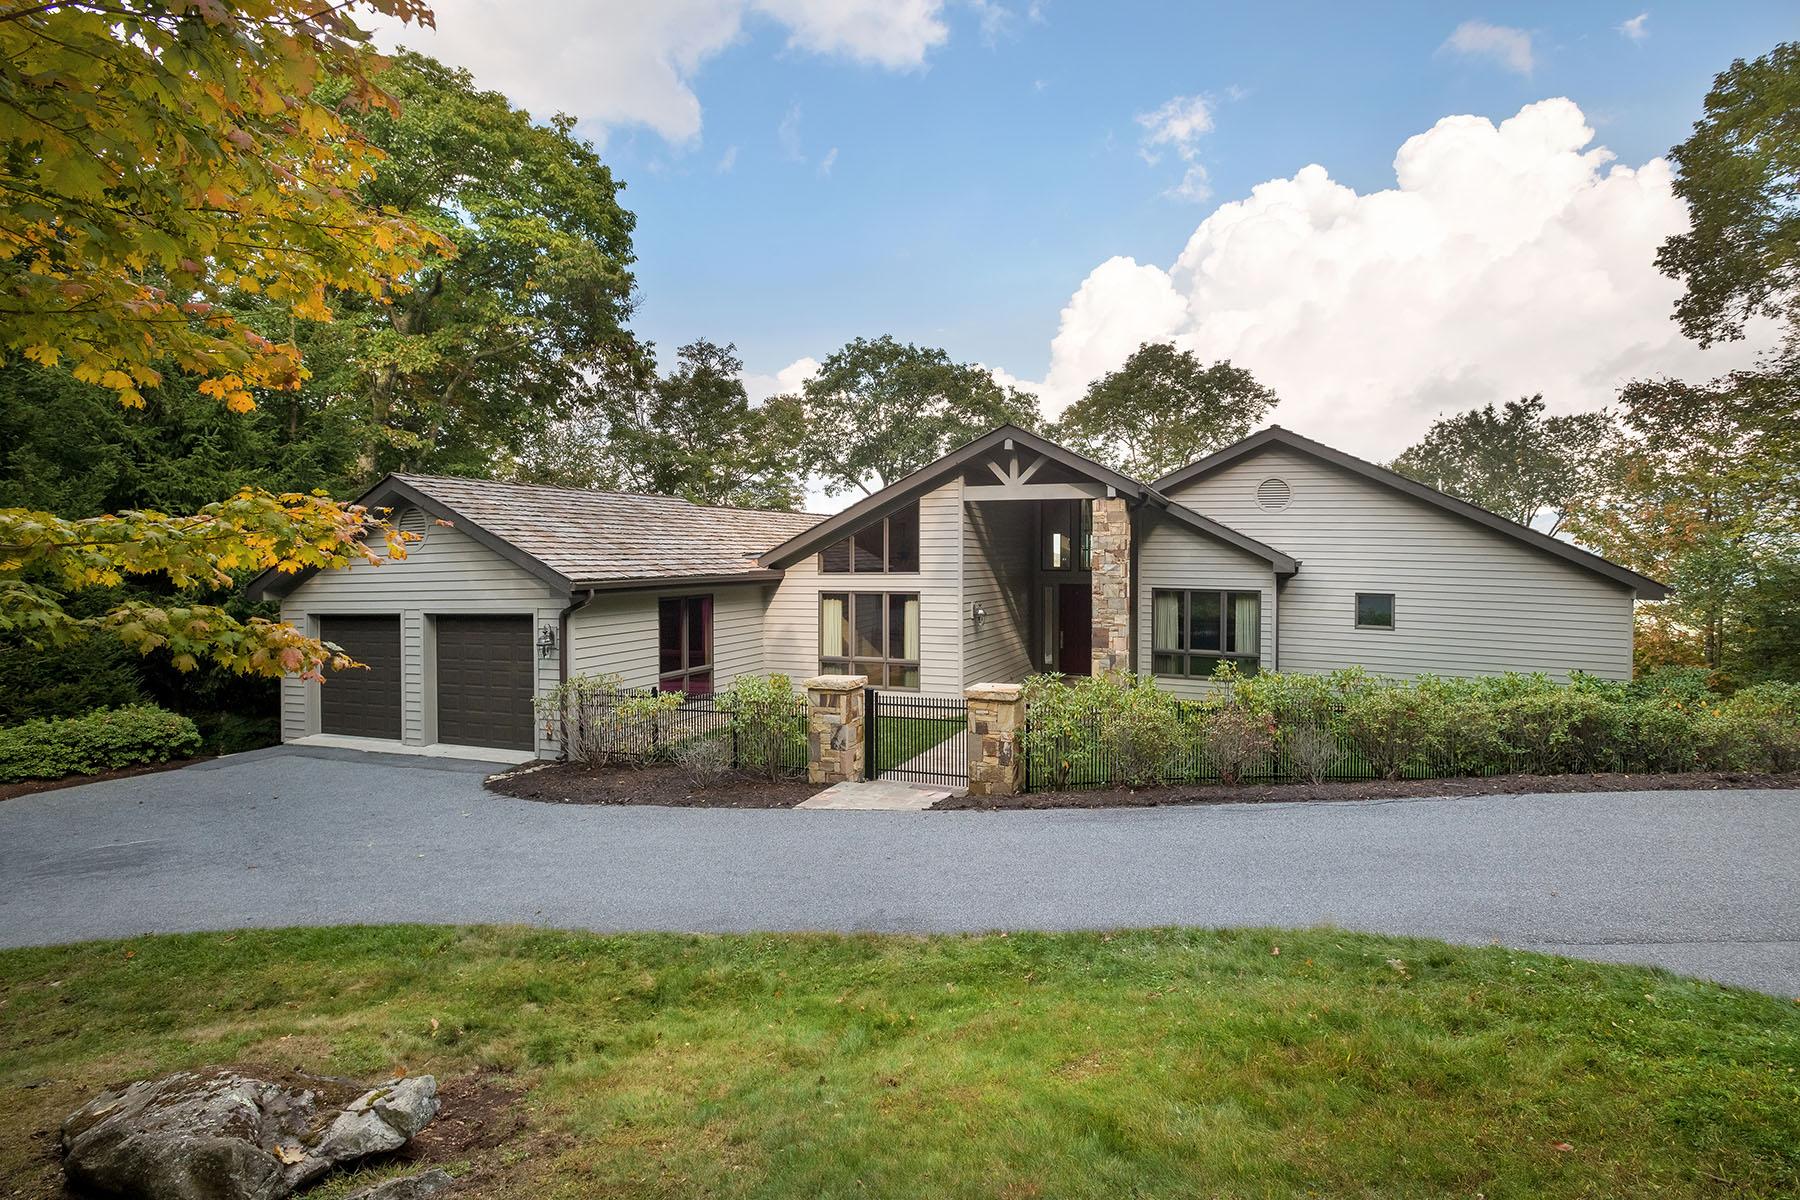 Single Family Homes for Sale at LINVILLE - LINVILLE RIDGE 1020 Ridge Dr Linville, North Carolina 28646 United States